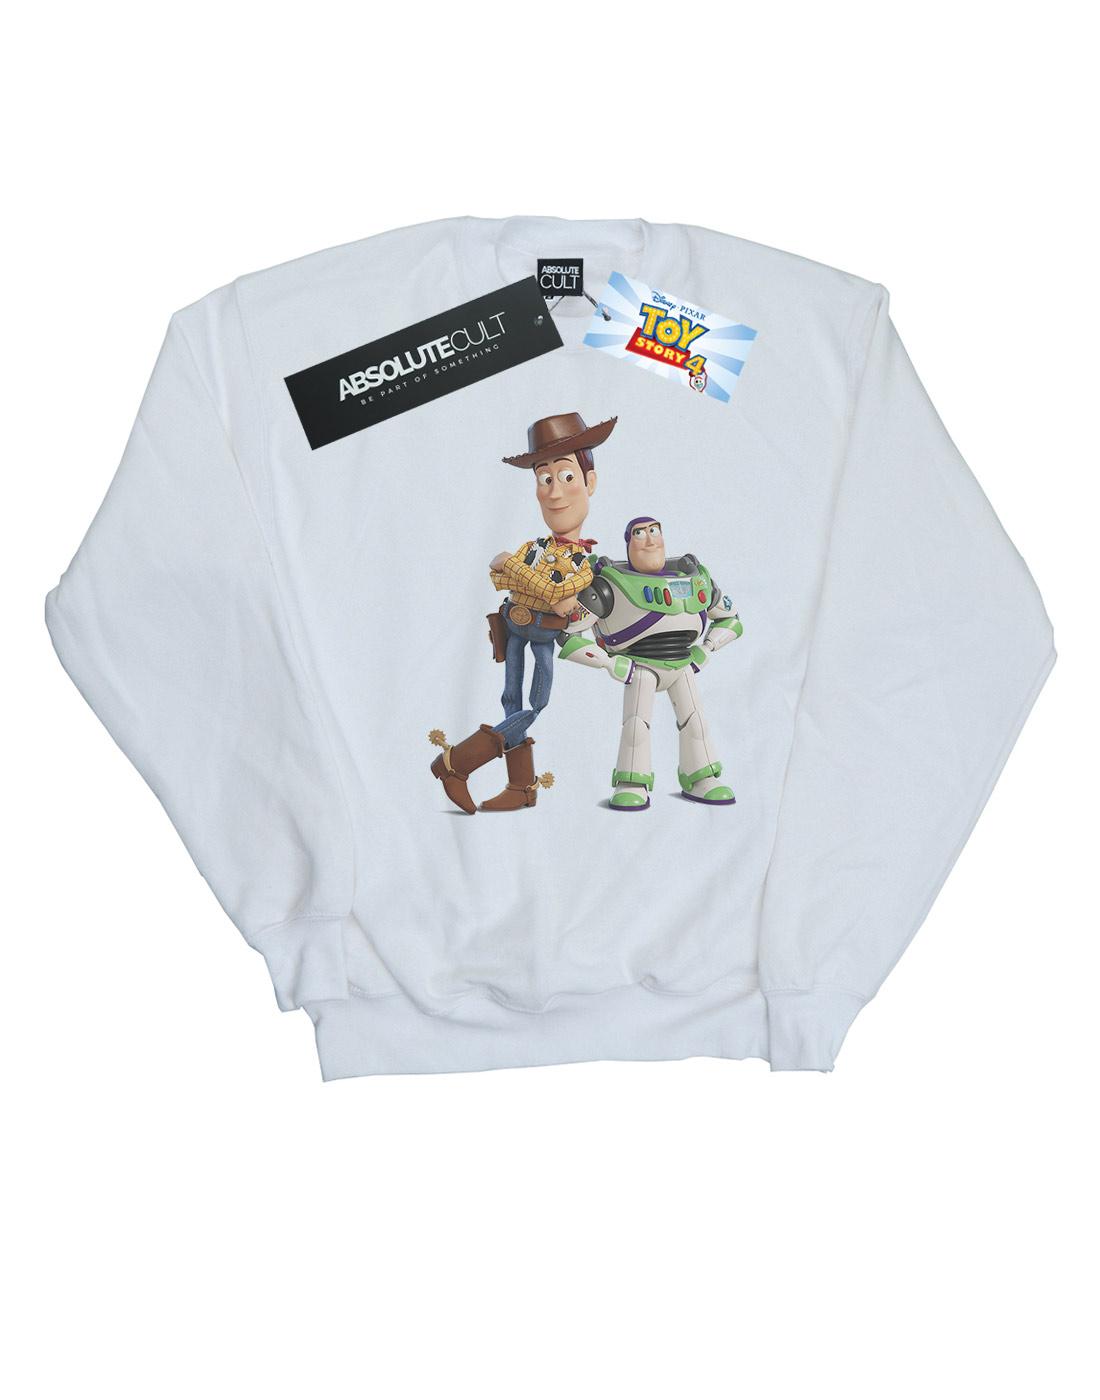 Disney-Girls-Toy-Story-Buzz-And-Woody-Standing-Sweatshirt thumbnail 8